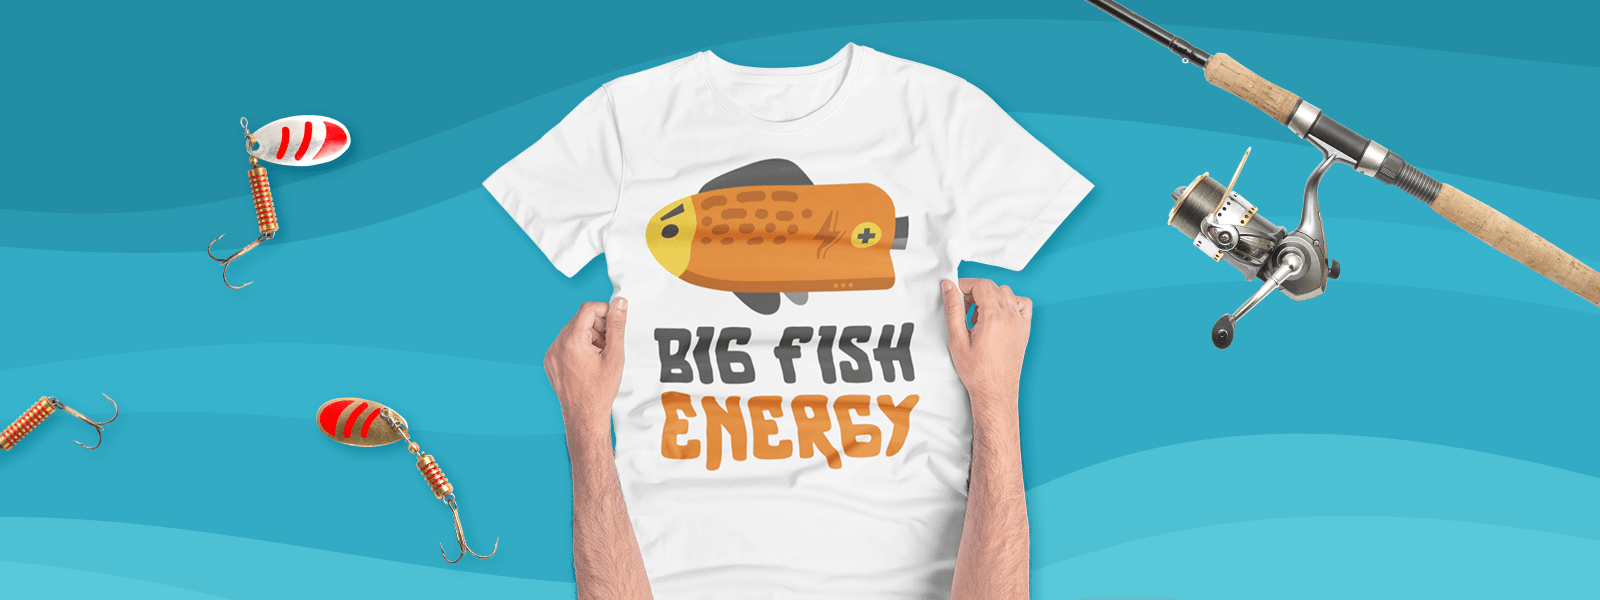 Custom Fishing Designs to Wear